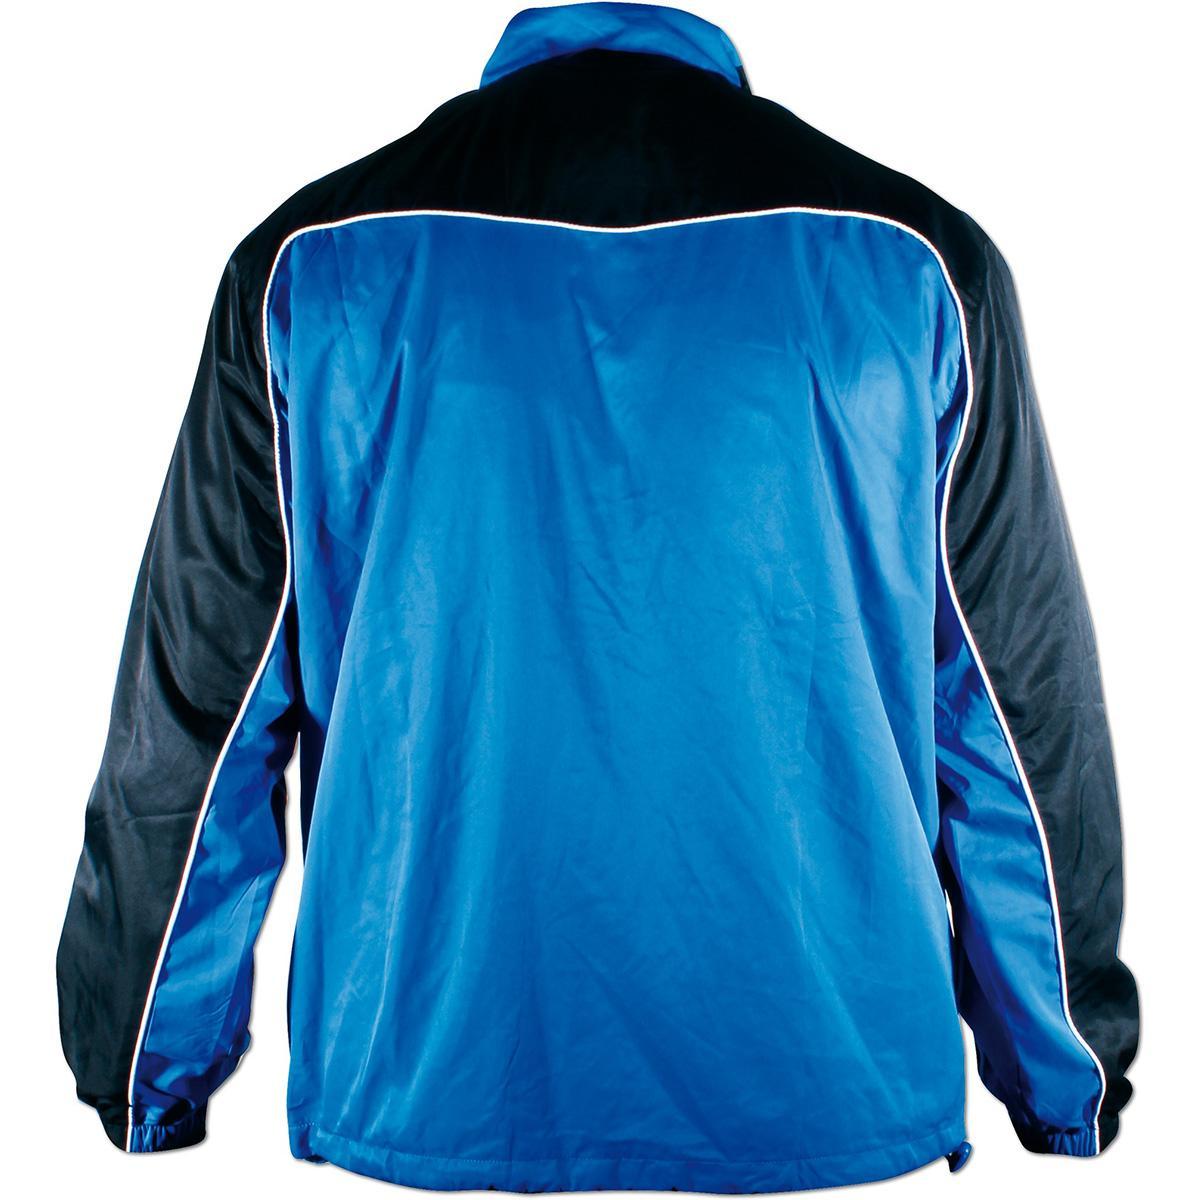 b8d1317d Victor Mens Team Line Tracksuit Jacket - Blue/Black - Tennisnuts.com